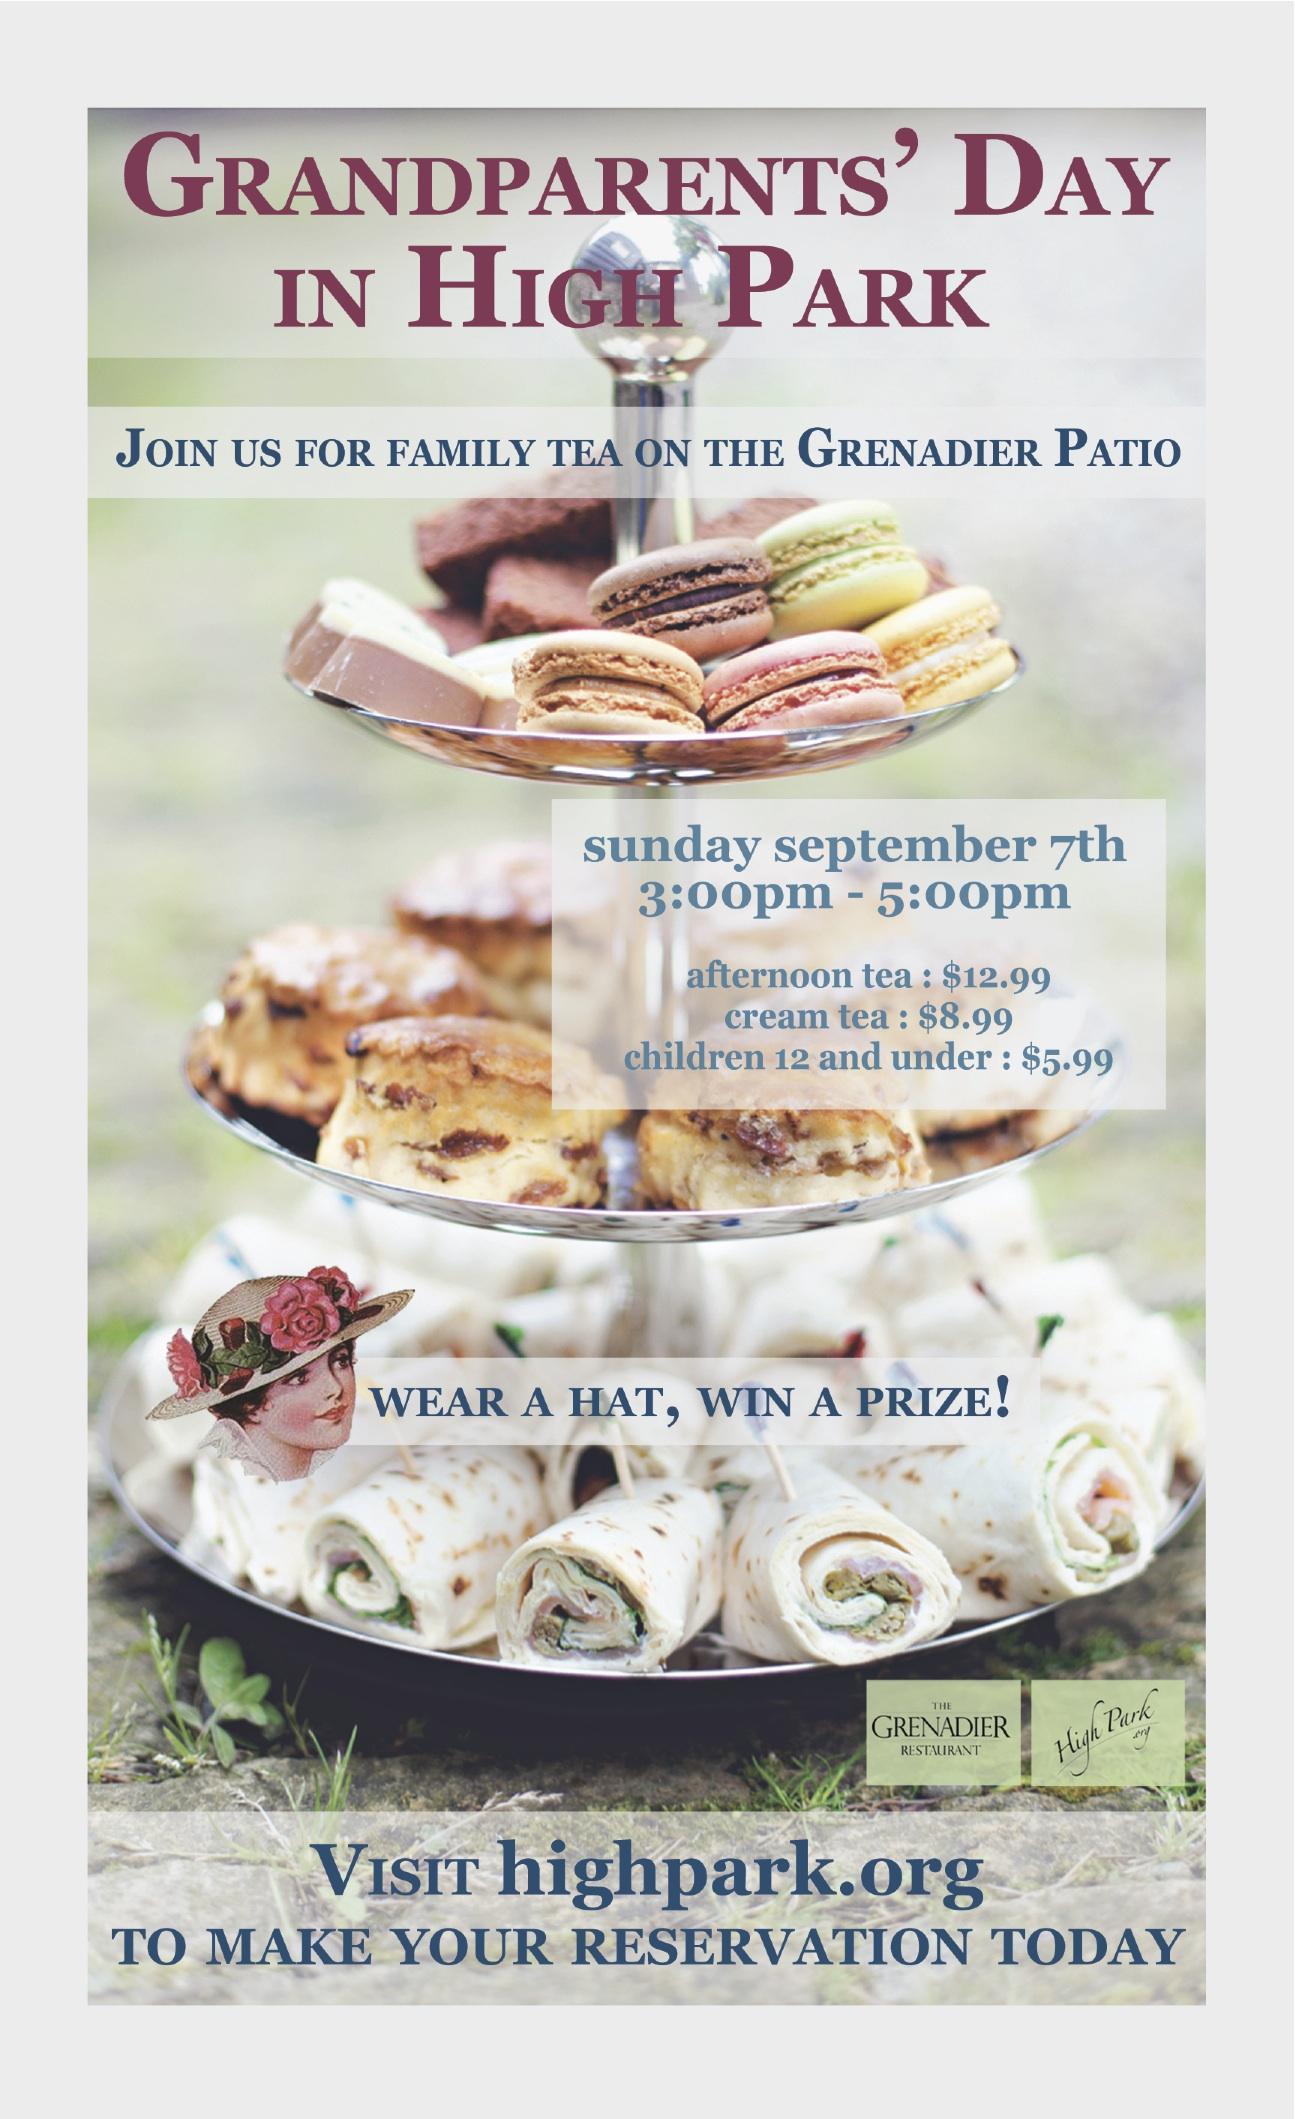 High Park Grandparents' Day Poster 2014 - PDF